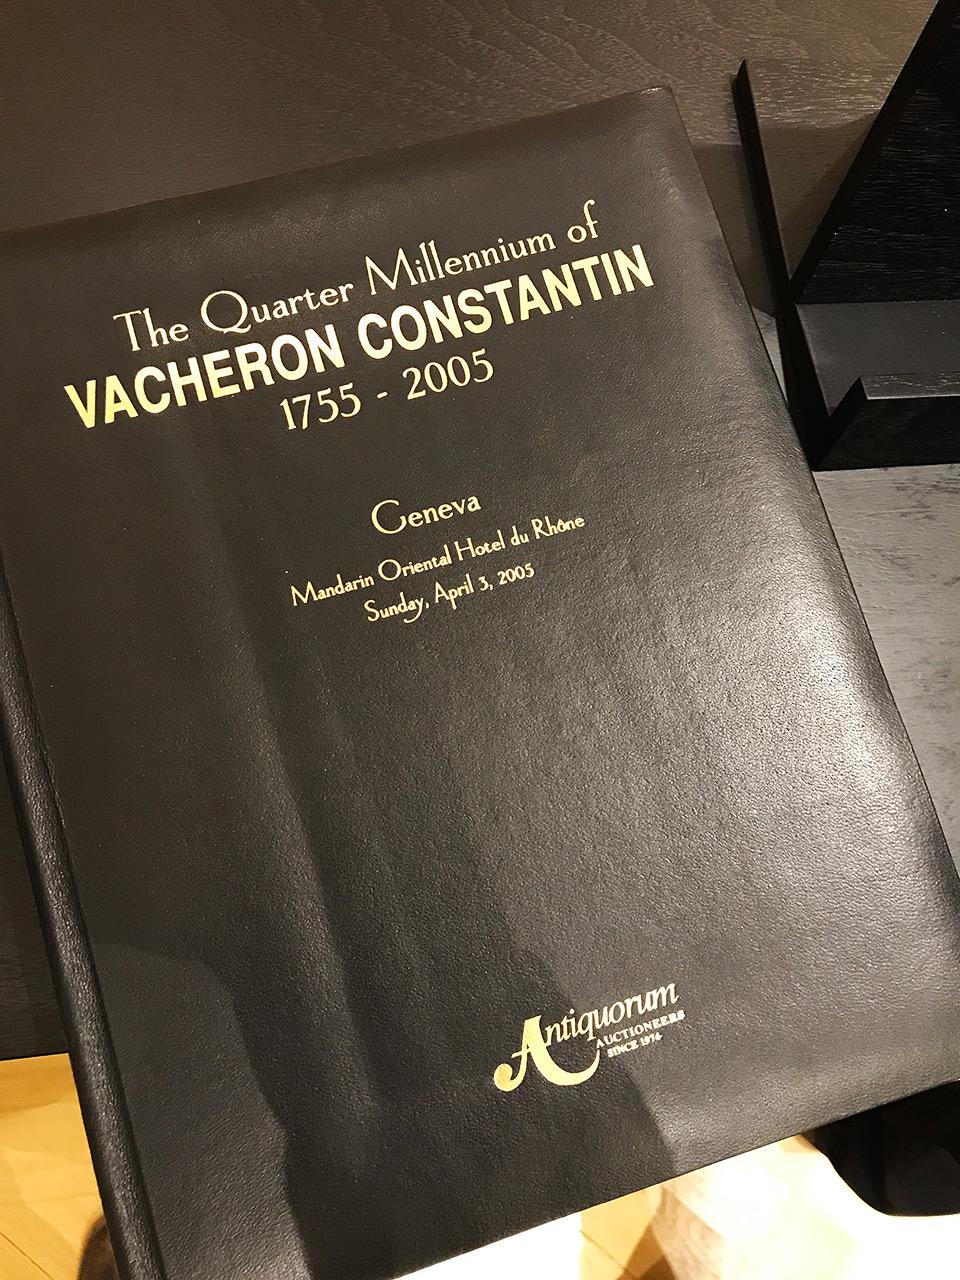 180319-vacheron-constantin-geneva-boutique-antiquorum-catalogue